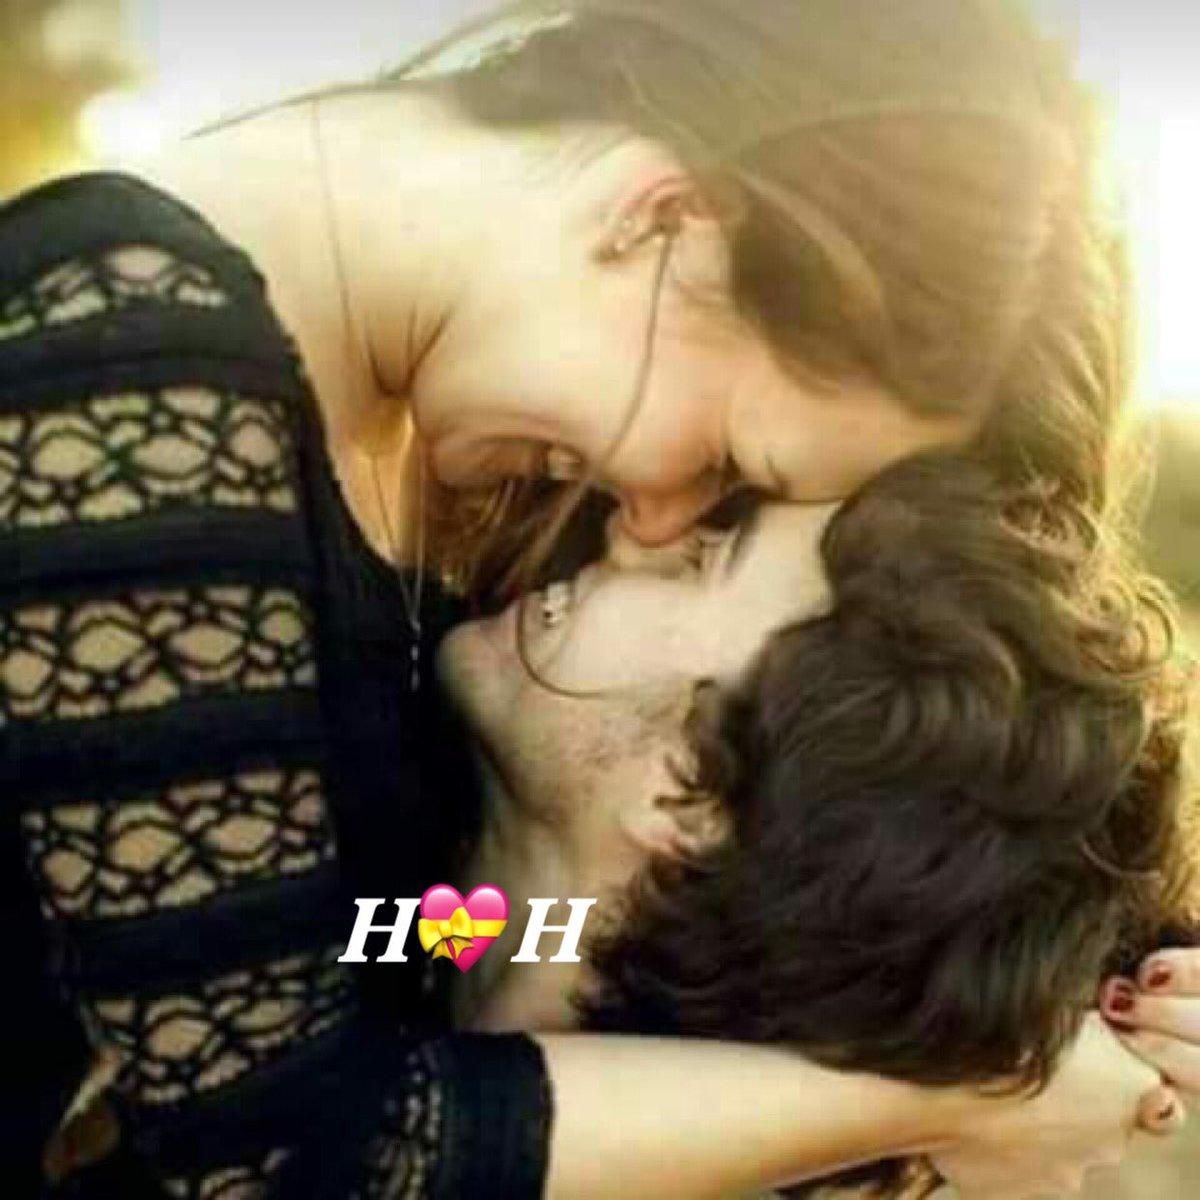 Hezamalgmali On Twitter اميرتي H لست حبيبتي فقط انتي فرحتي